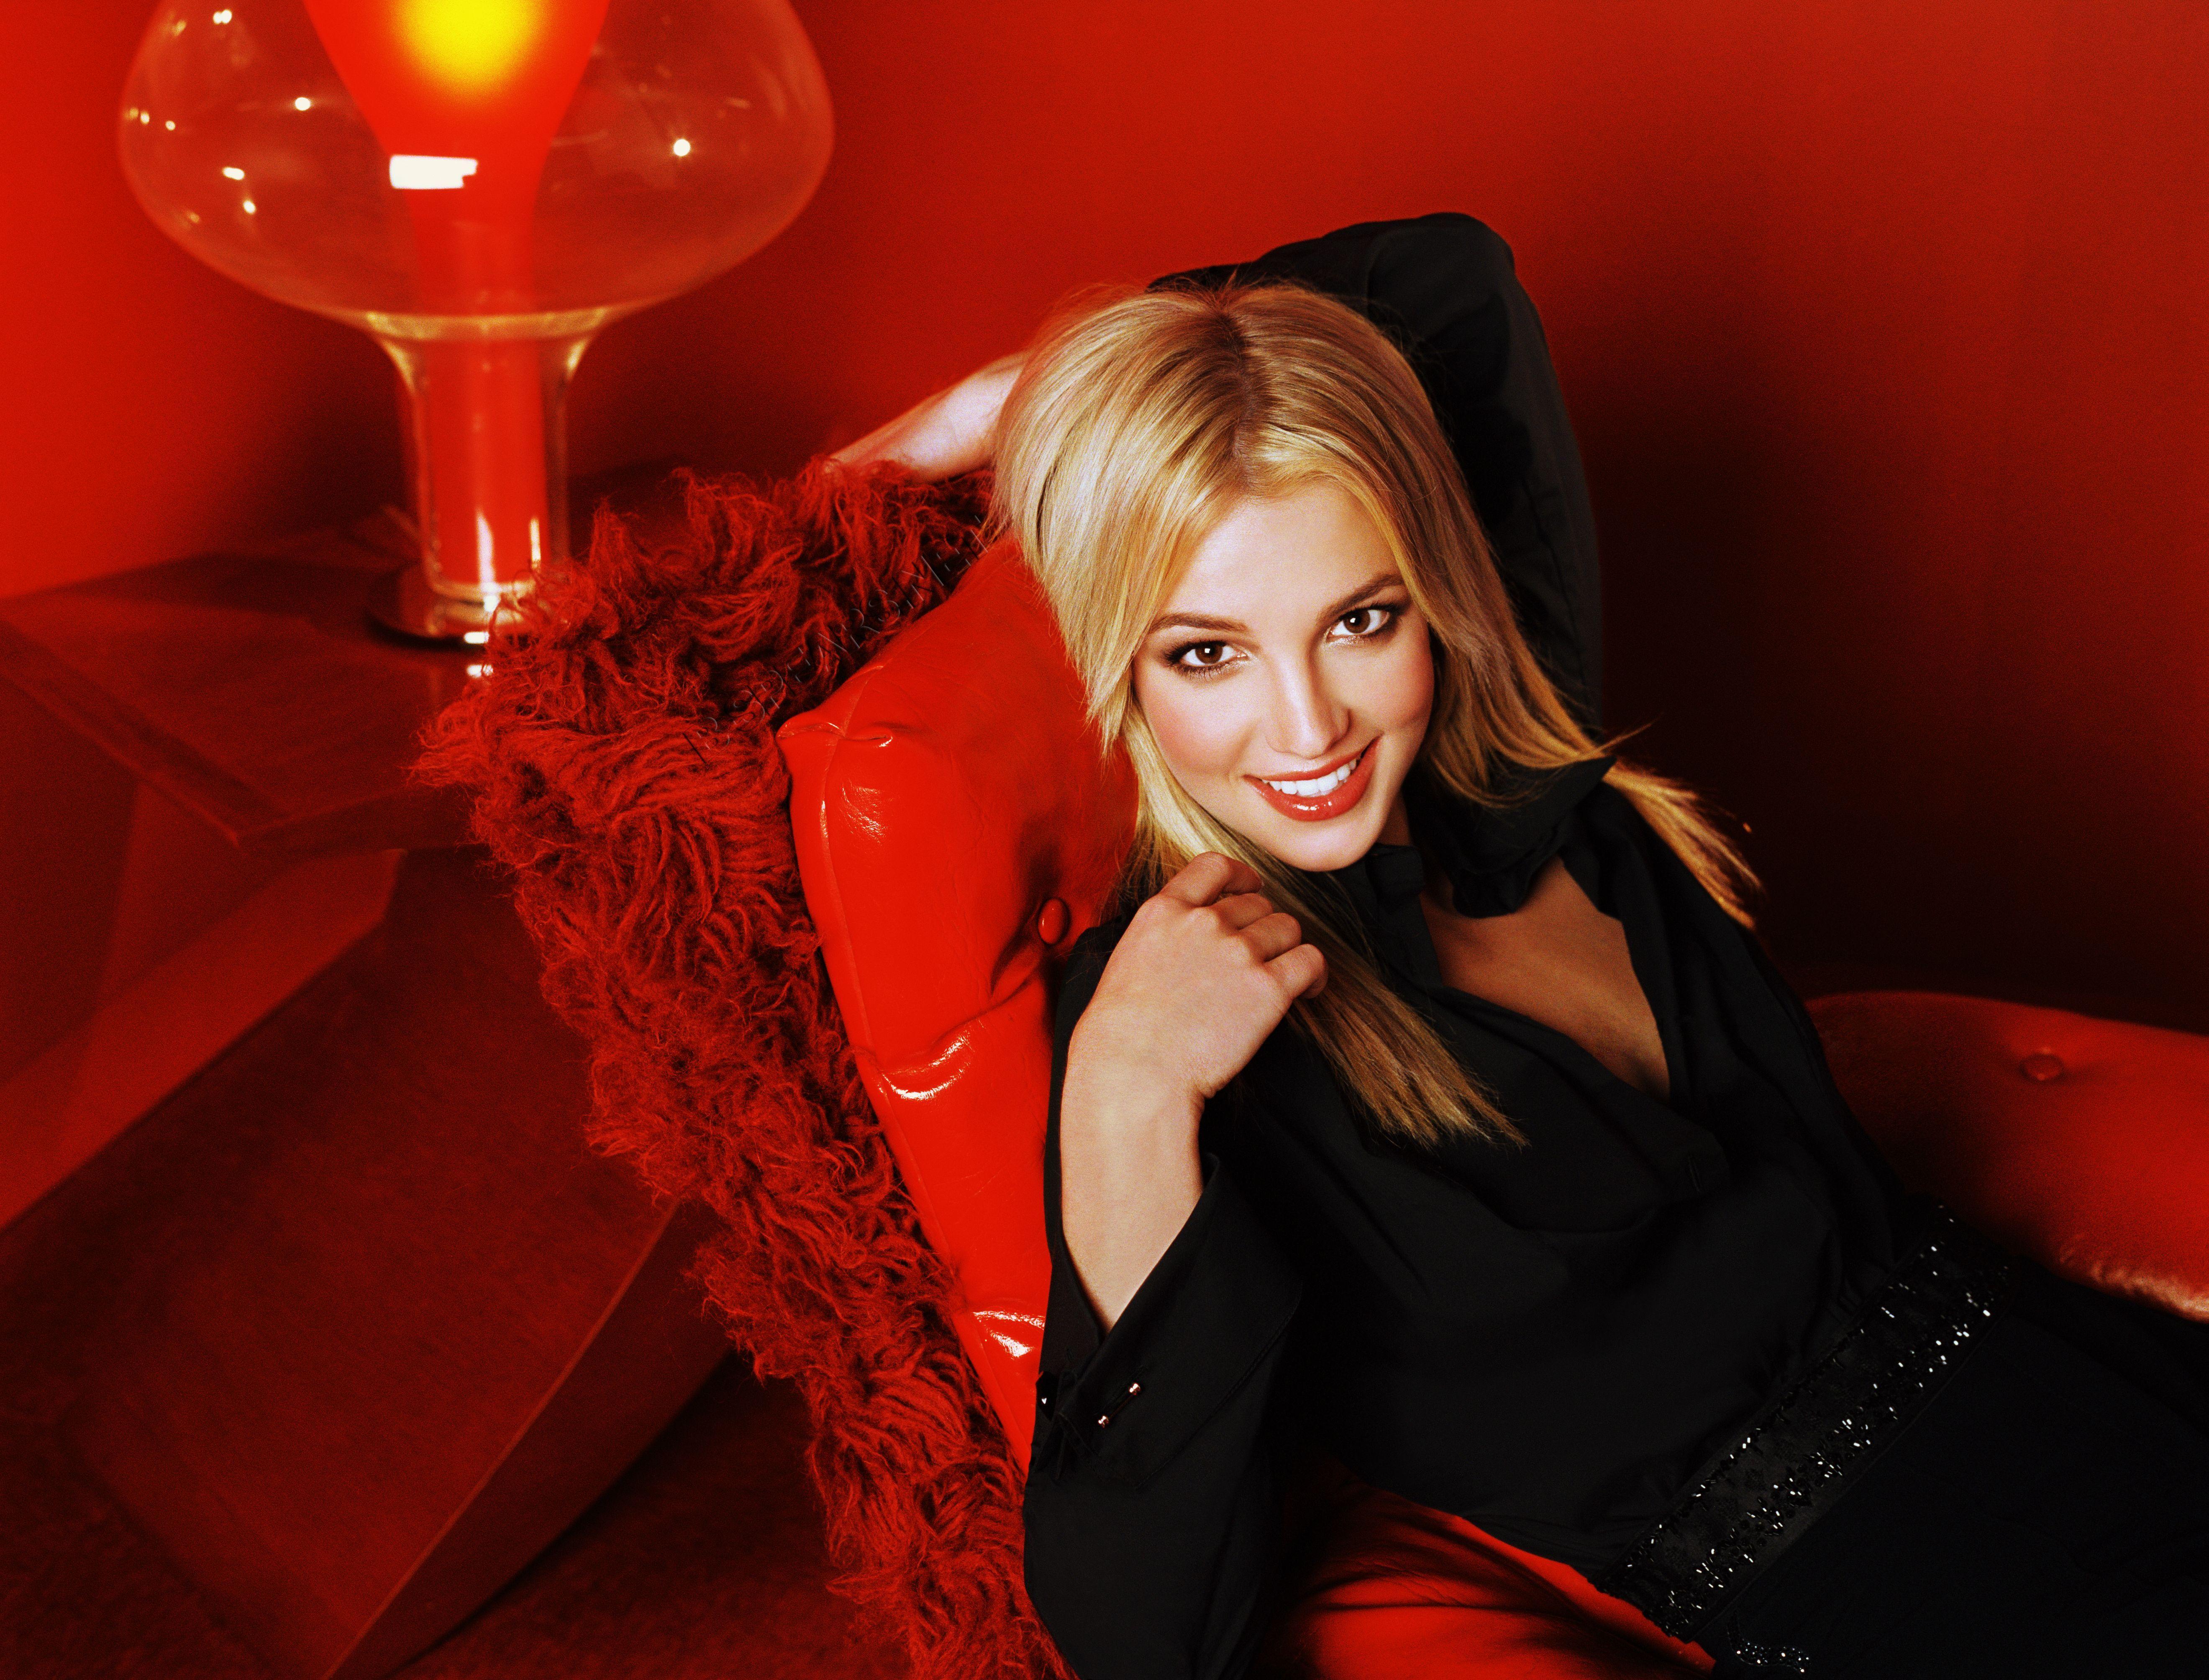 Britney Spears New Hd Wallpapers 2013   World Celebrities